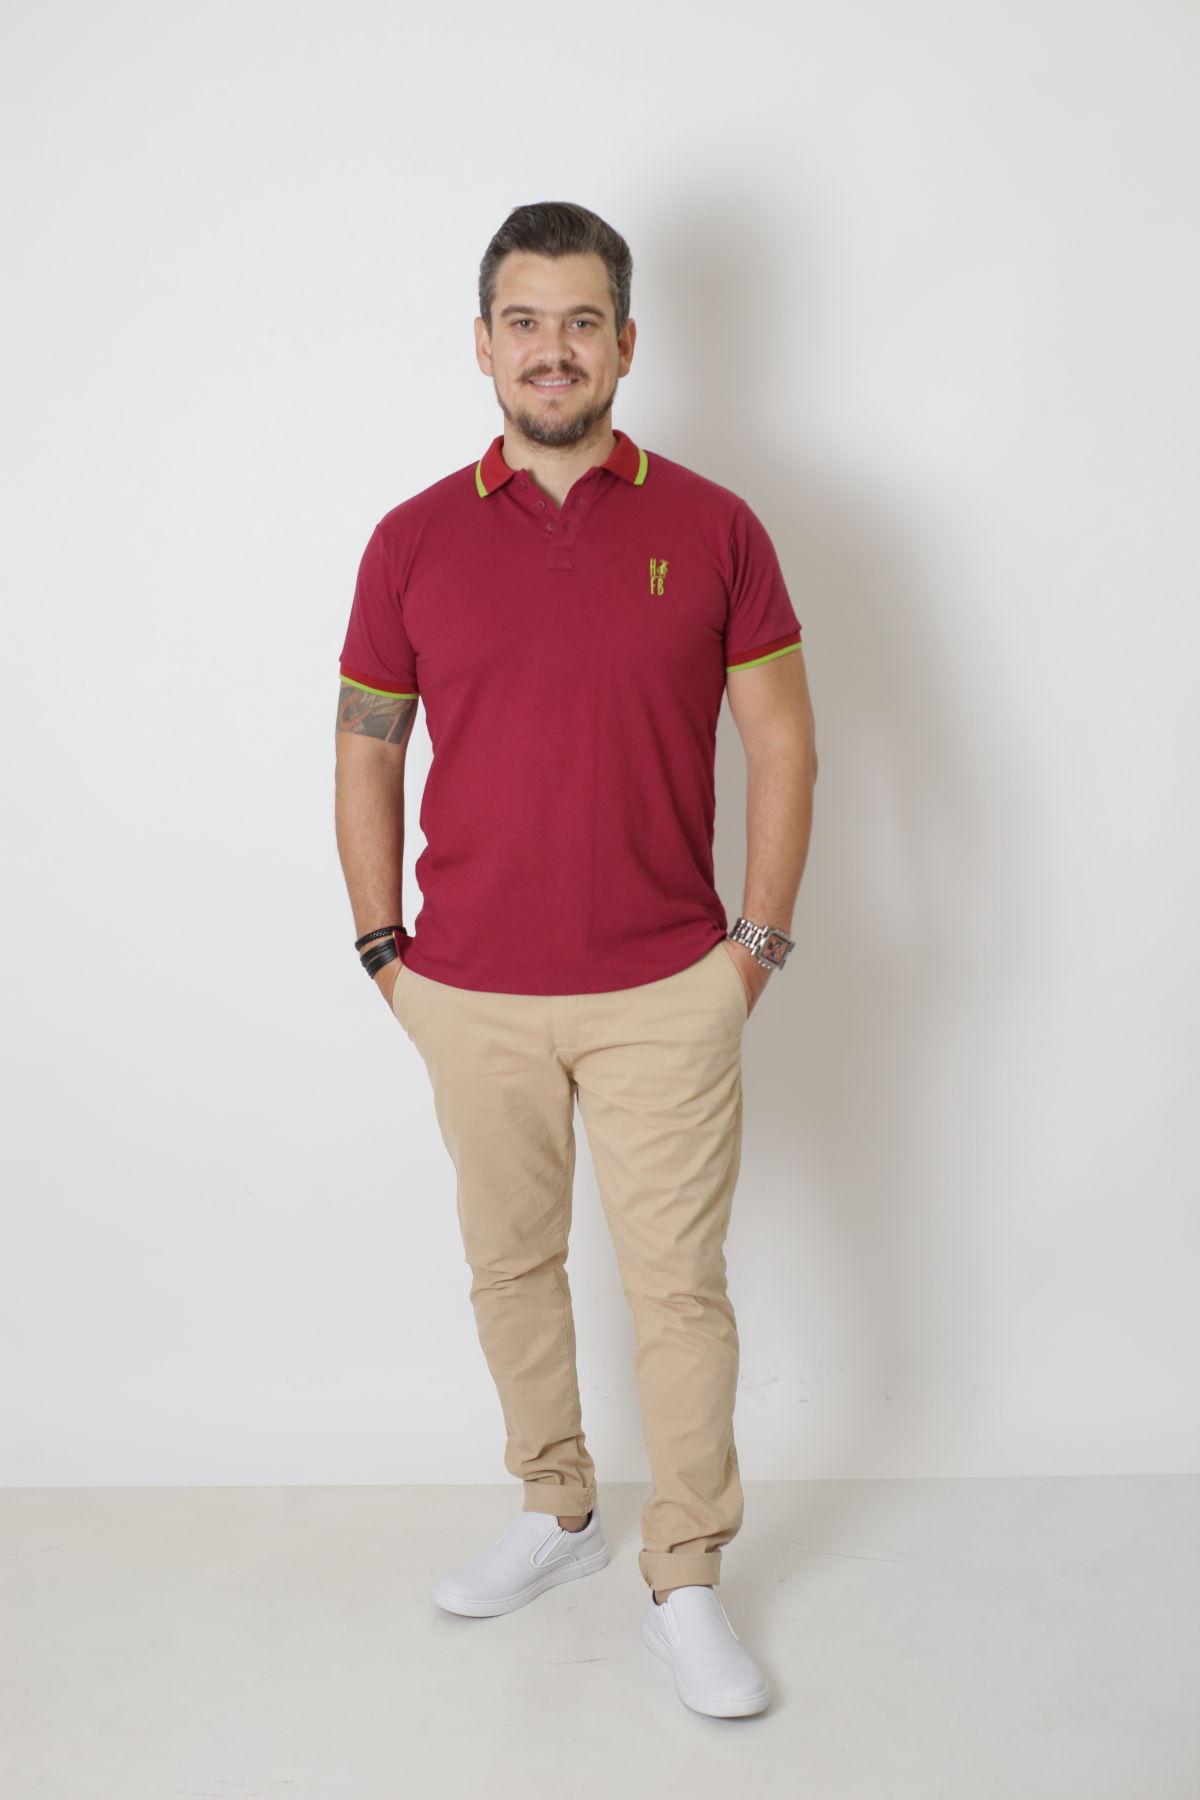 PAI E FILHOS > Kit 02 Peças Camisa + Body Polo - Bordo  [Coleção Tal Pai Tal Filho]  - Heitor Fashion Brazil